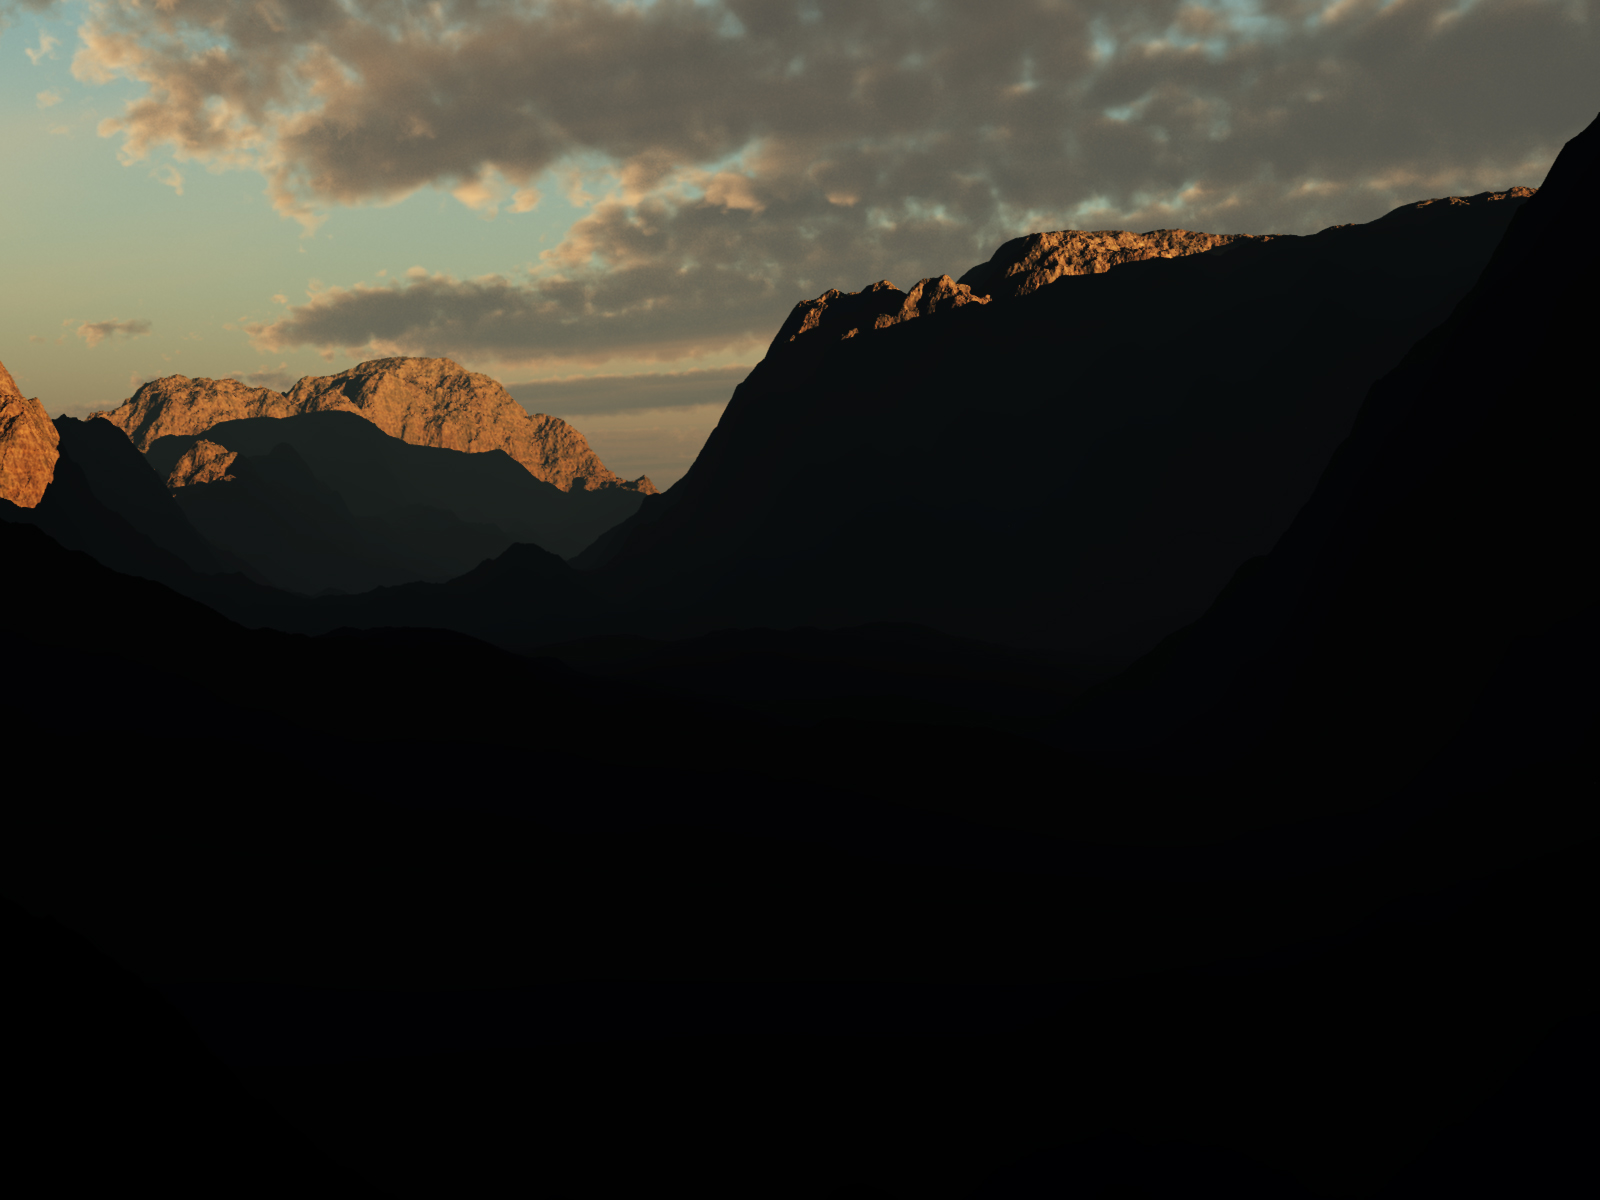 Sunset Basin by mariusp